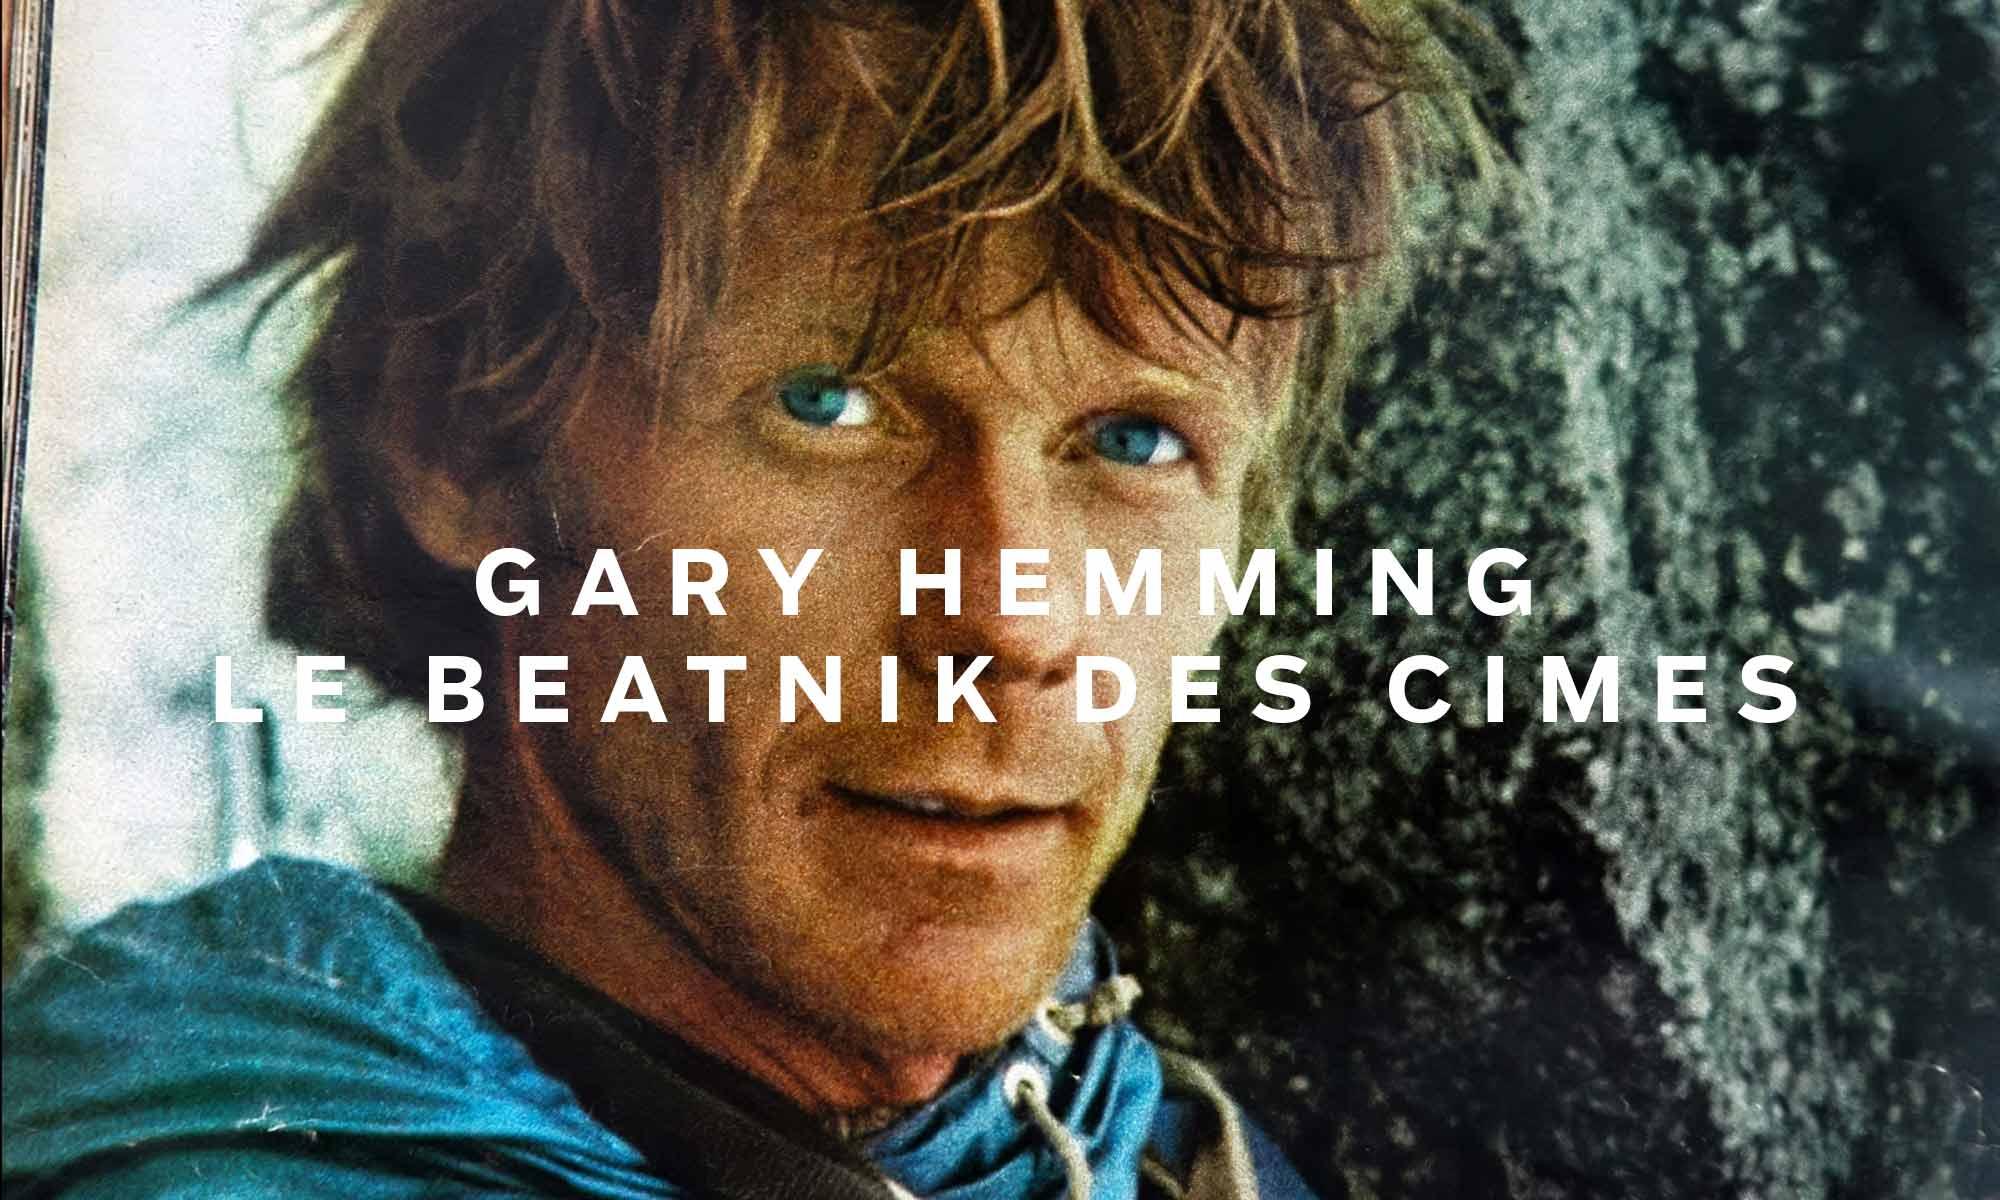 Gary Hemming, le beatnik des cimes